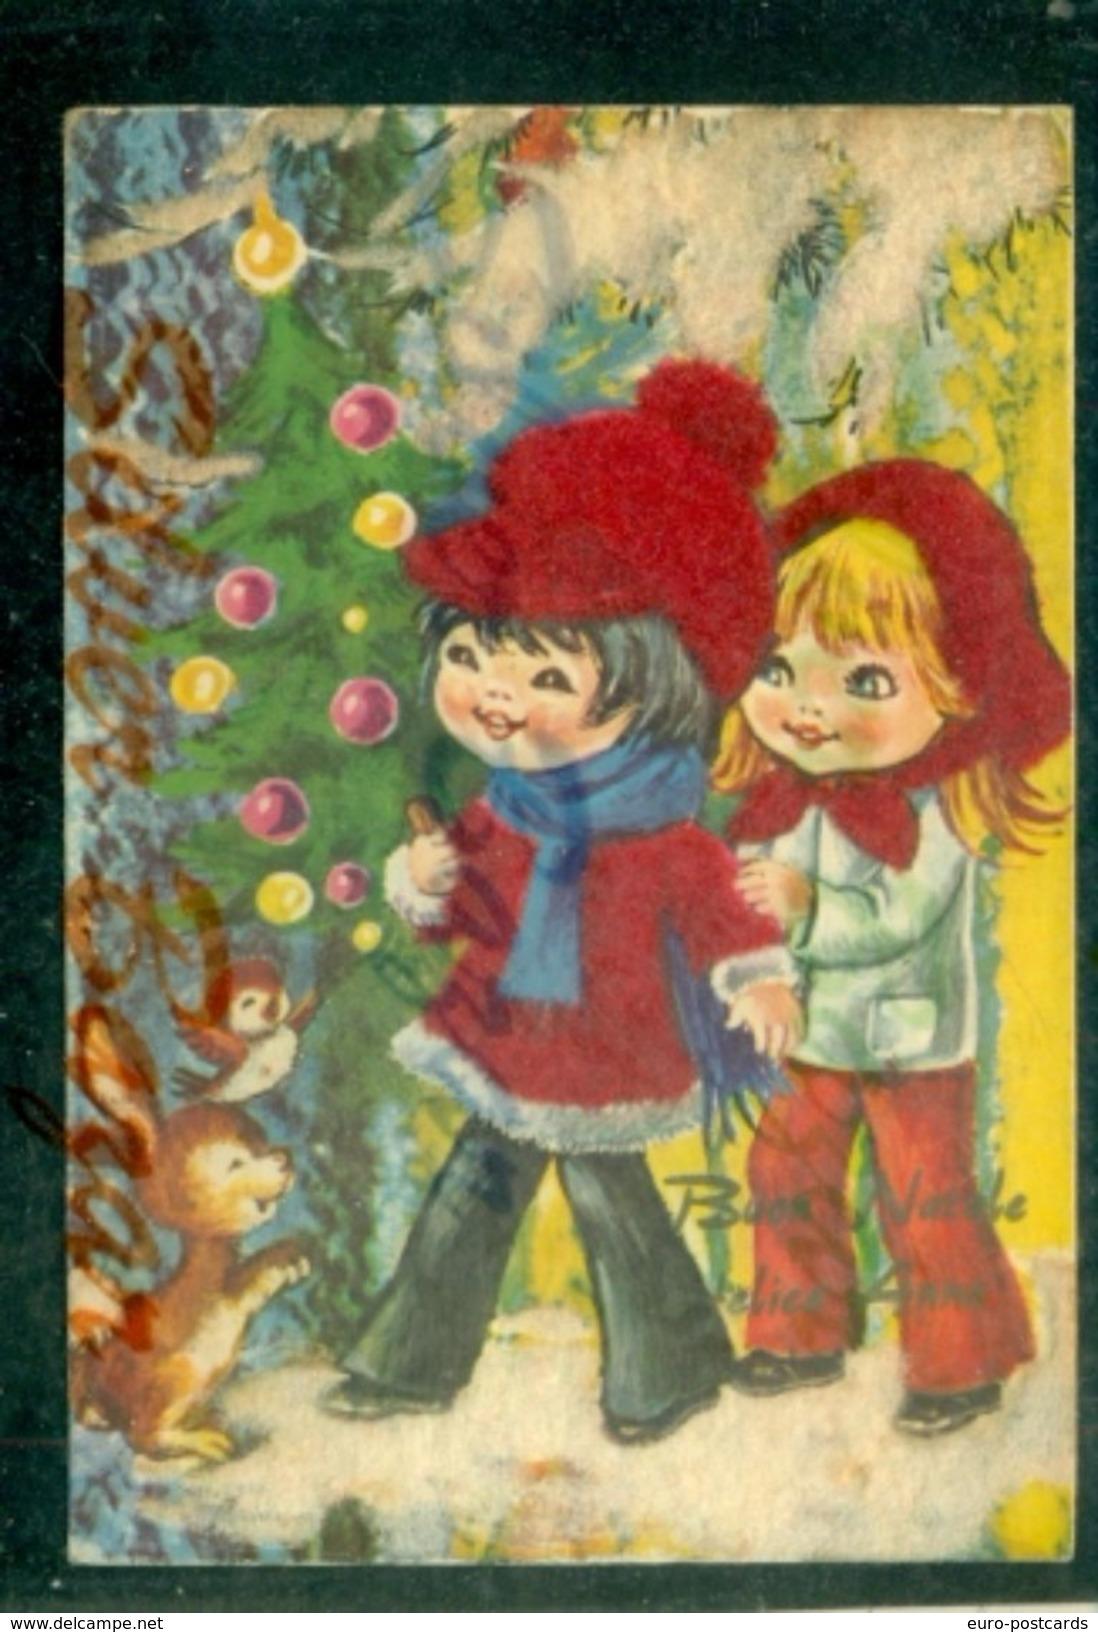 CARTOLINA  VELLUTO-CARTE VELOURS-VELVET CARD-BAMBINI - Cartoline